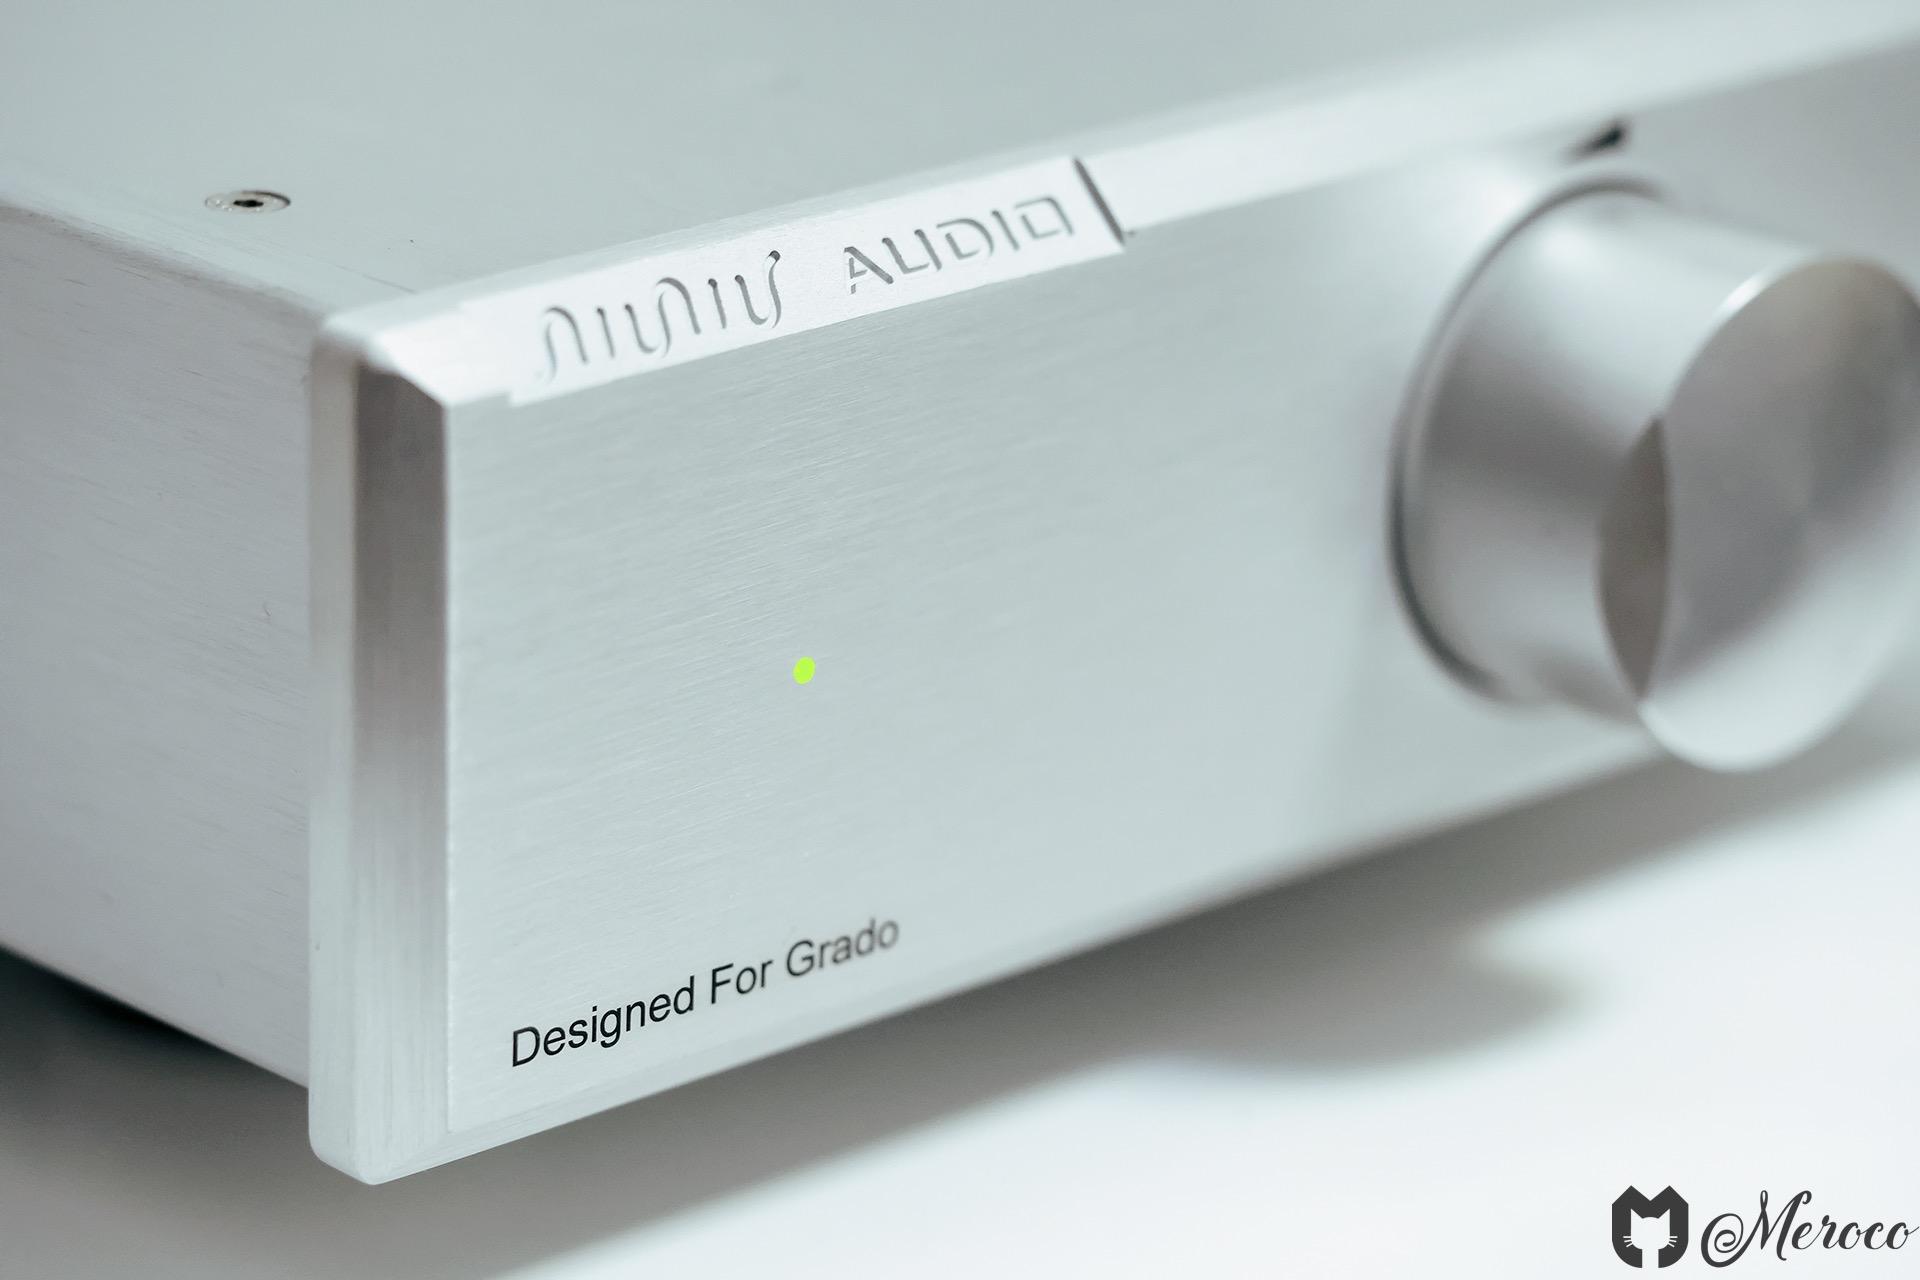 NIUNIU_AUDIO_AMP_detail.jpg